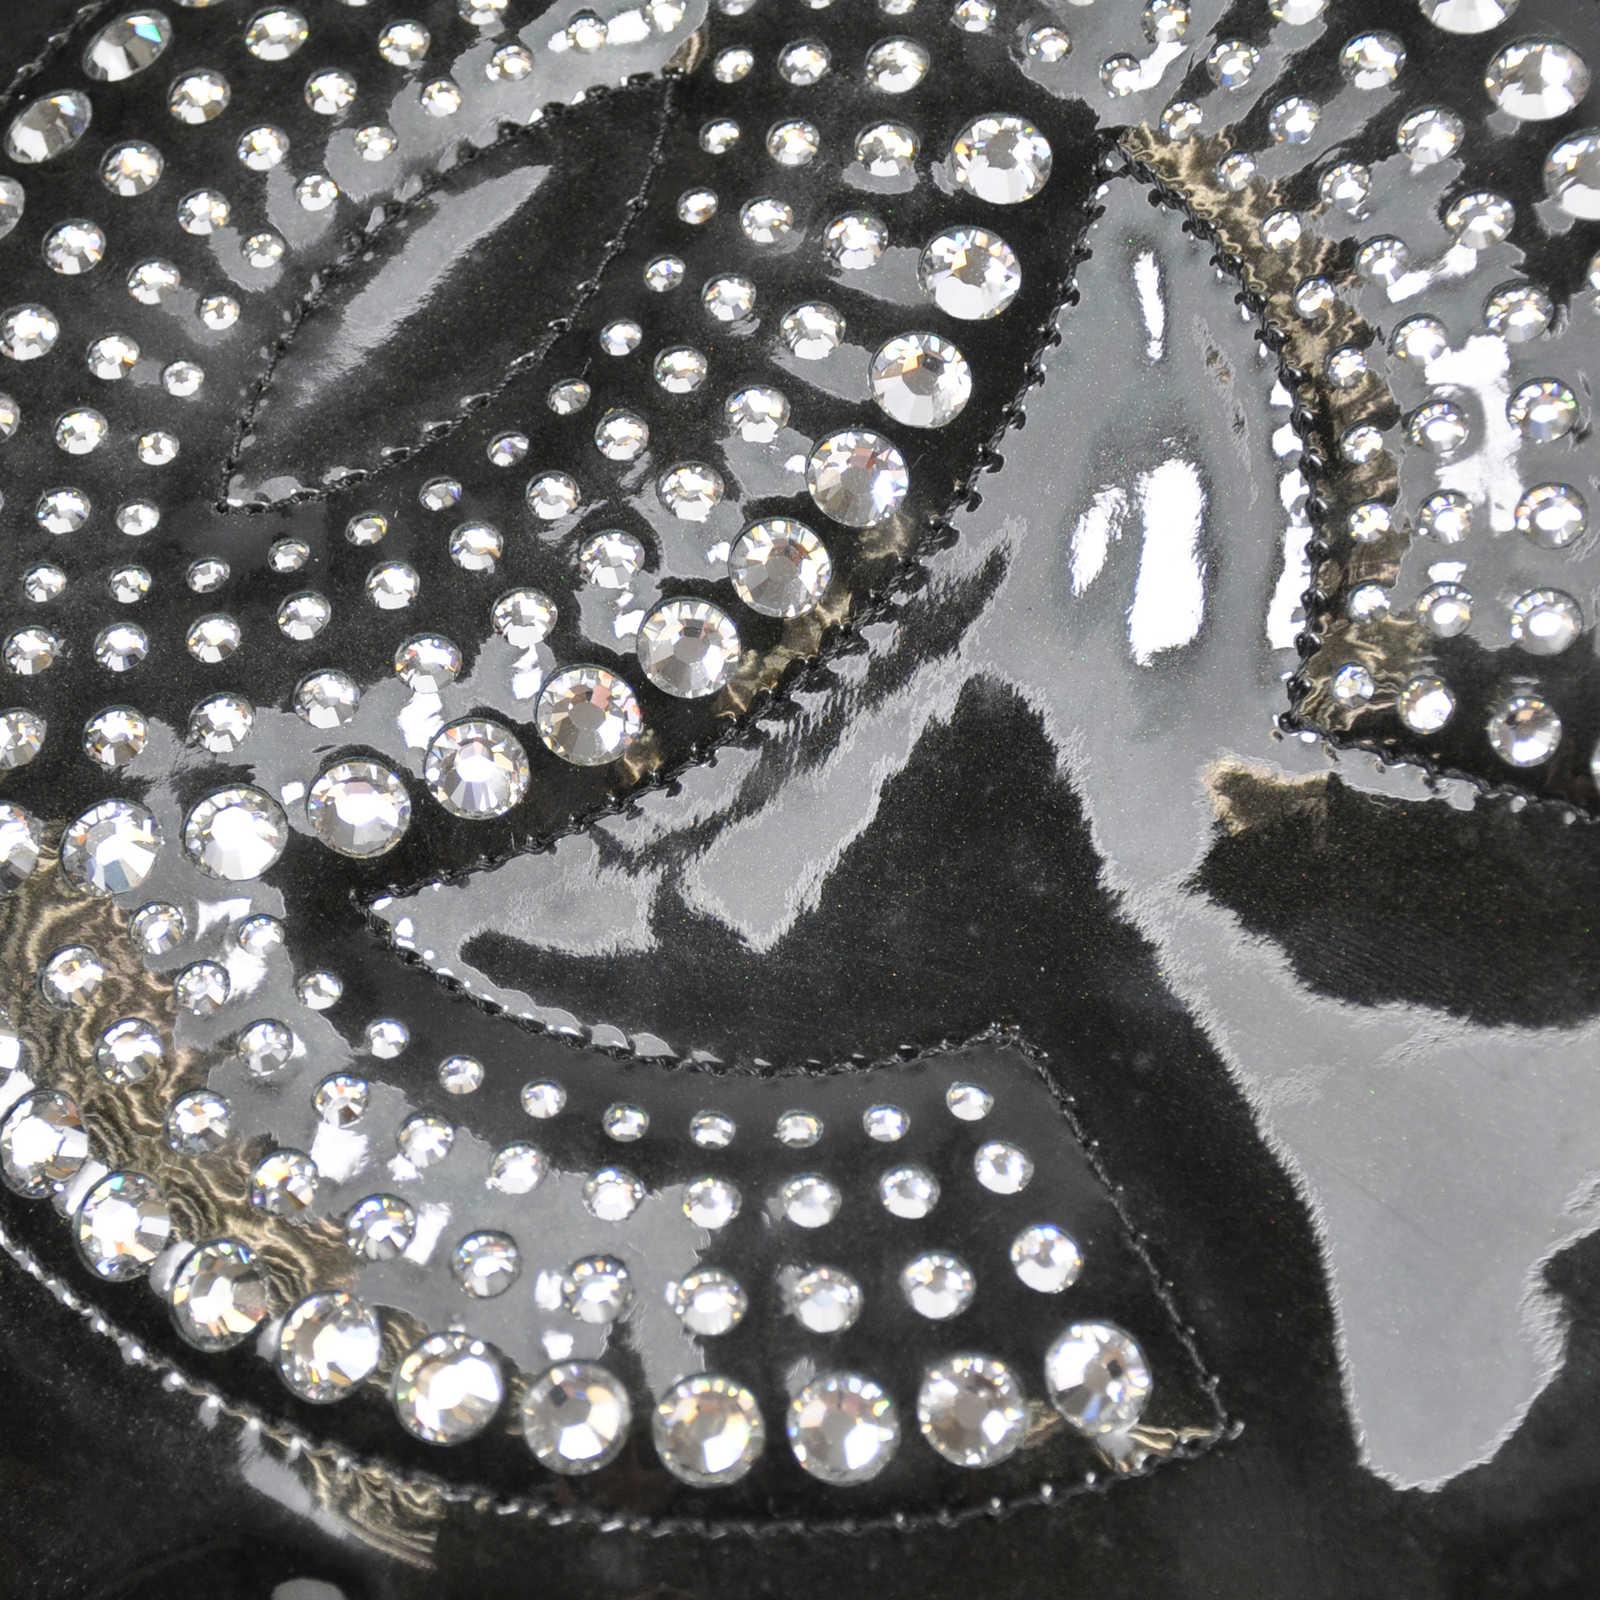 4171d62ff757 ... Authentic Second Hand Chanel Patent Lambskin Bon Bon Tote Bag  (PSS-062-00007 ...